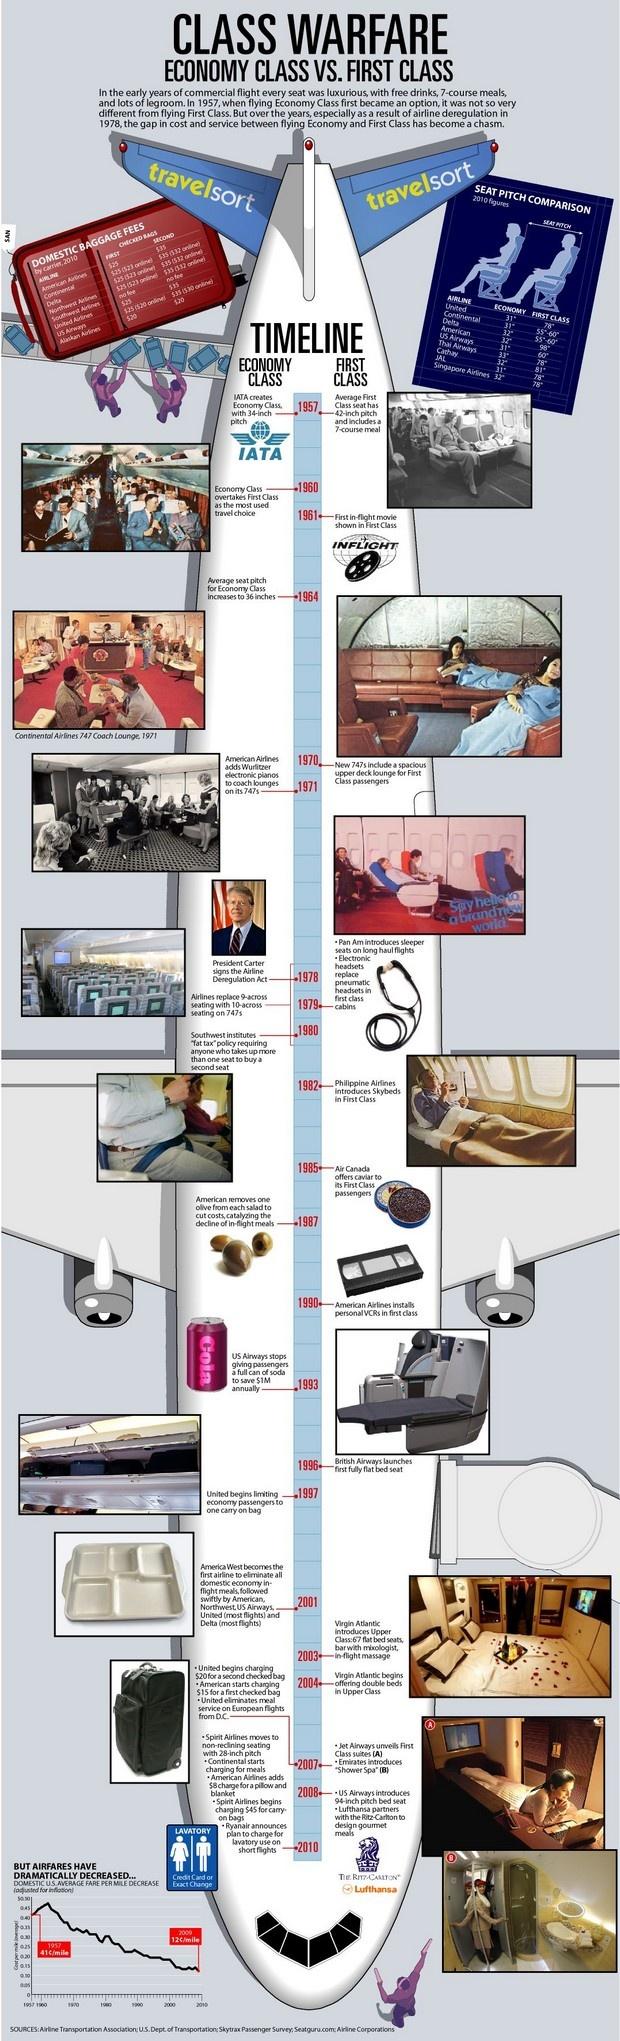 Class Warfare: Economy Class vs. First Class 1957-2010